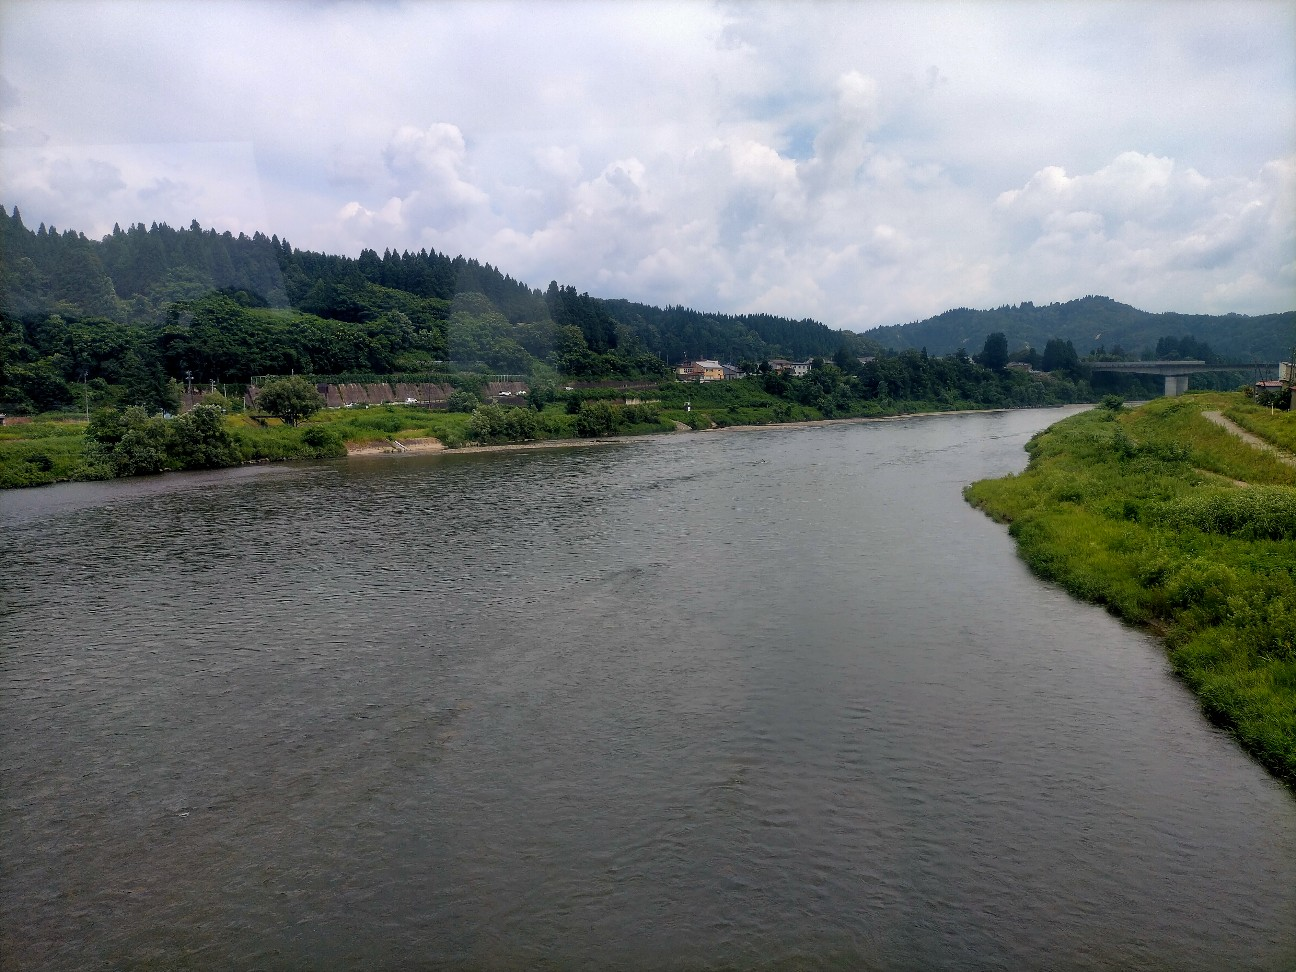 f:id:tamikiti67:20210726141150j:image